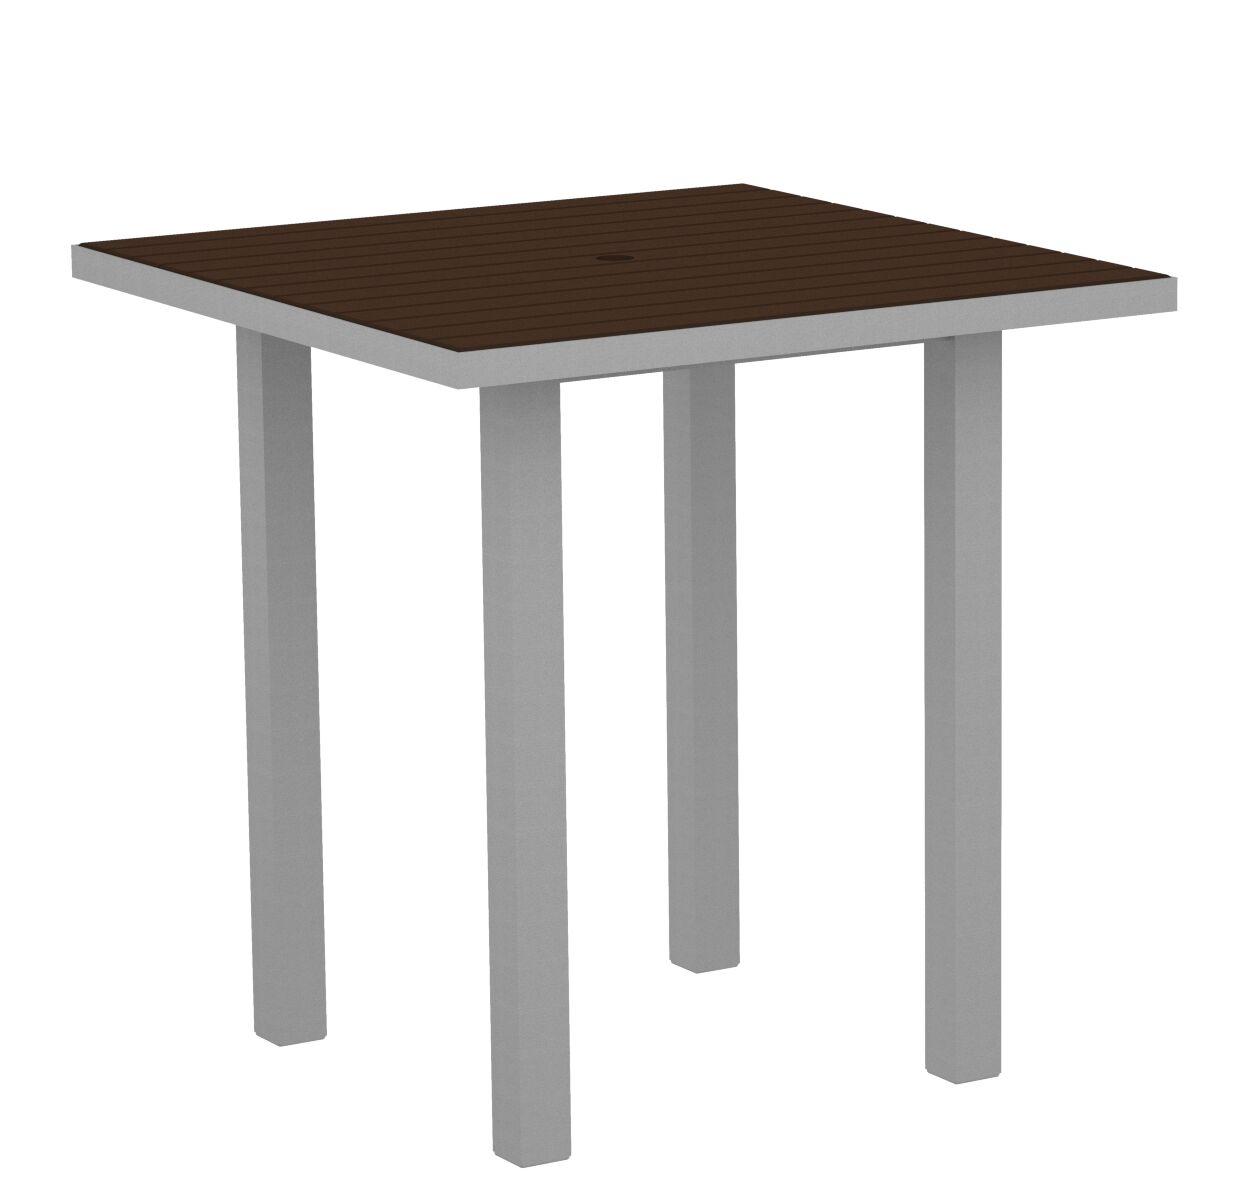 Euro Side Table Base Finish: Textured Silver, Top Finish: Mahogany